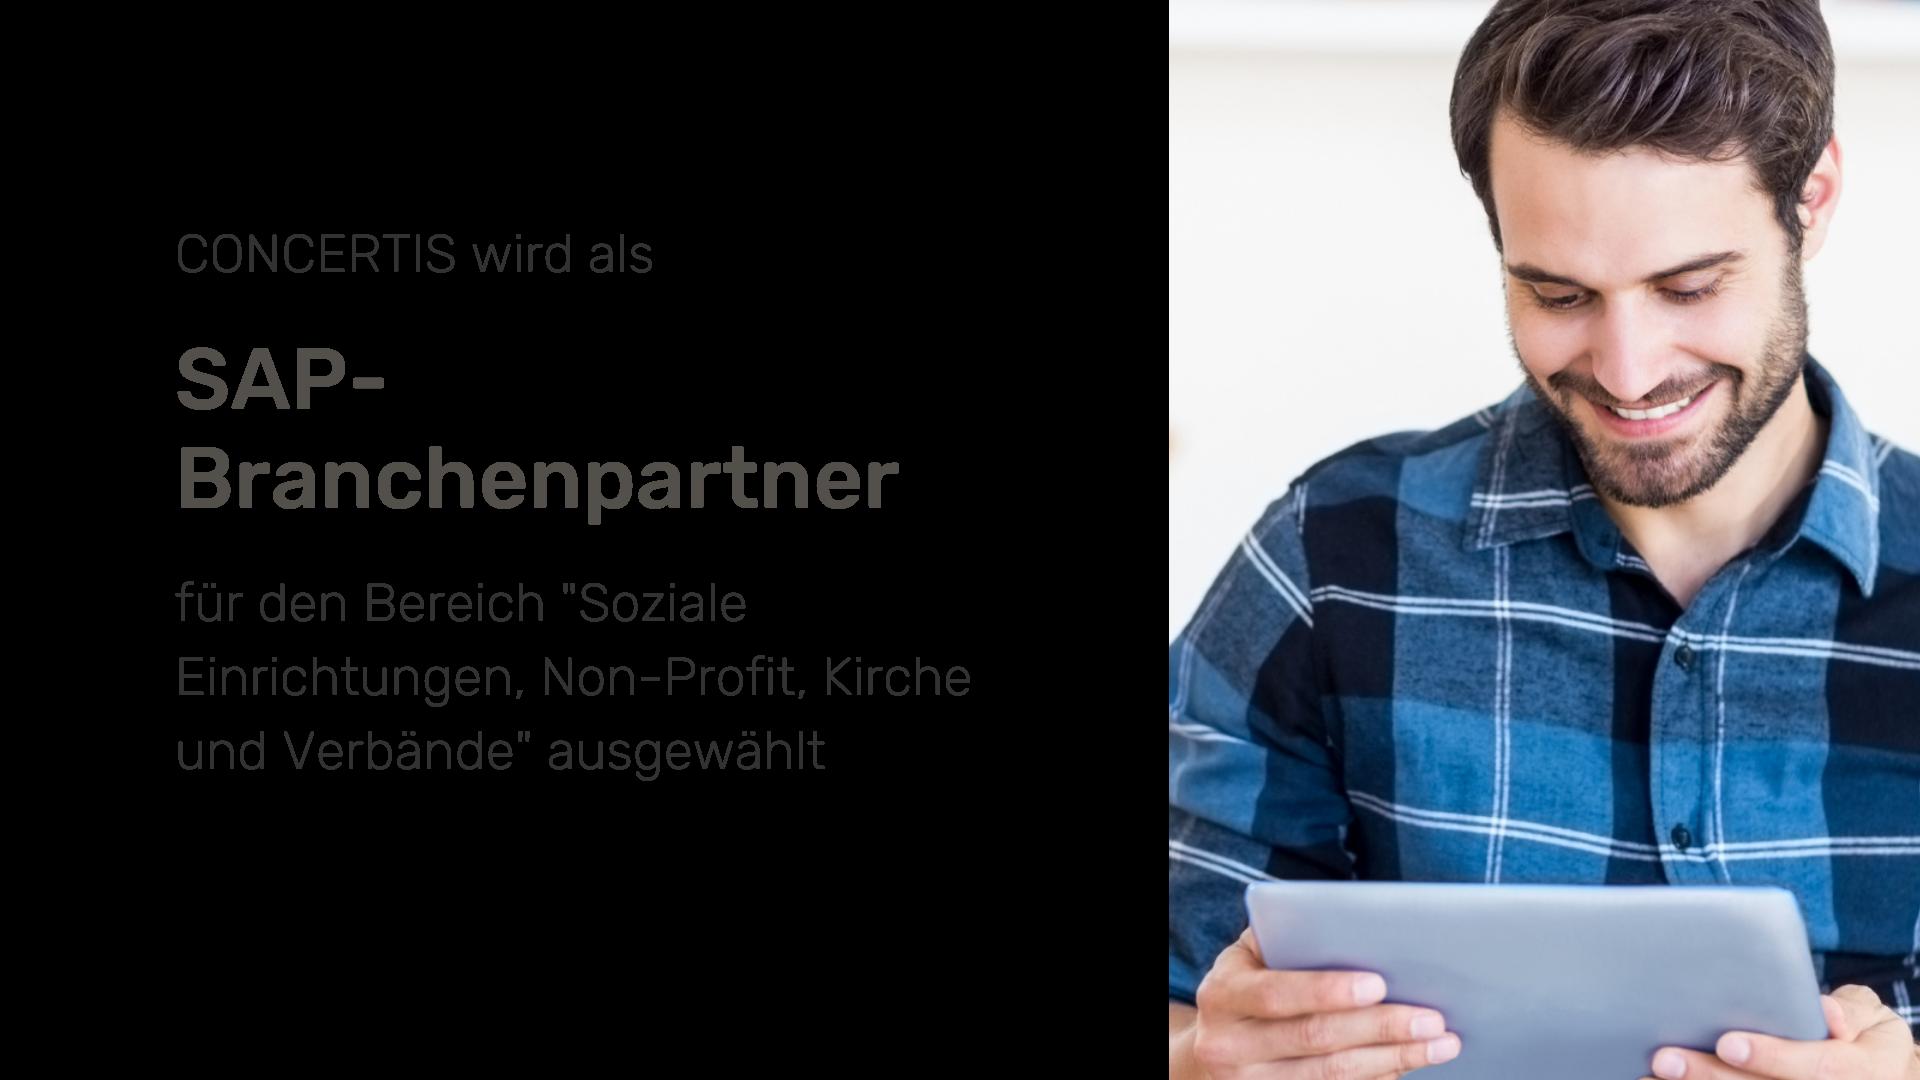 SAP-Branchenpartner